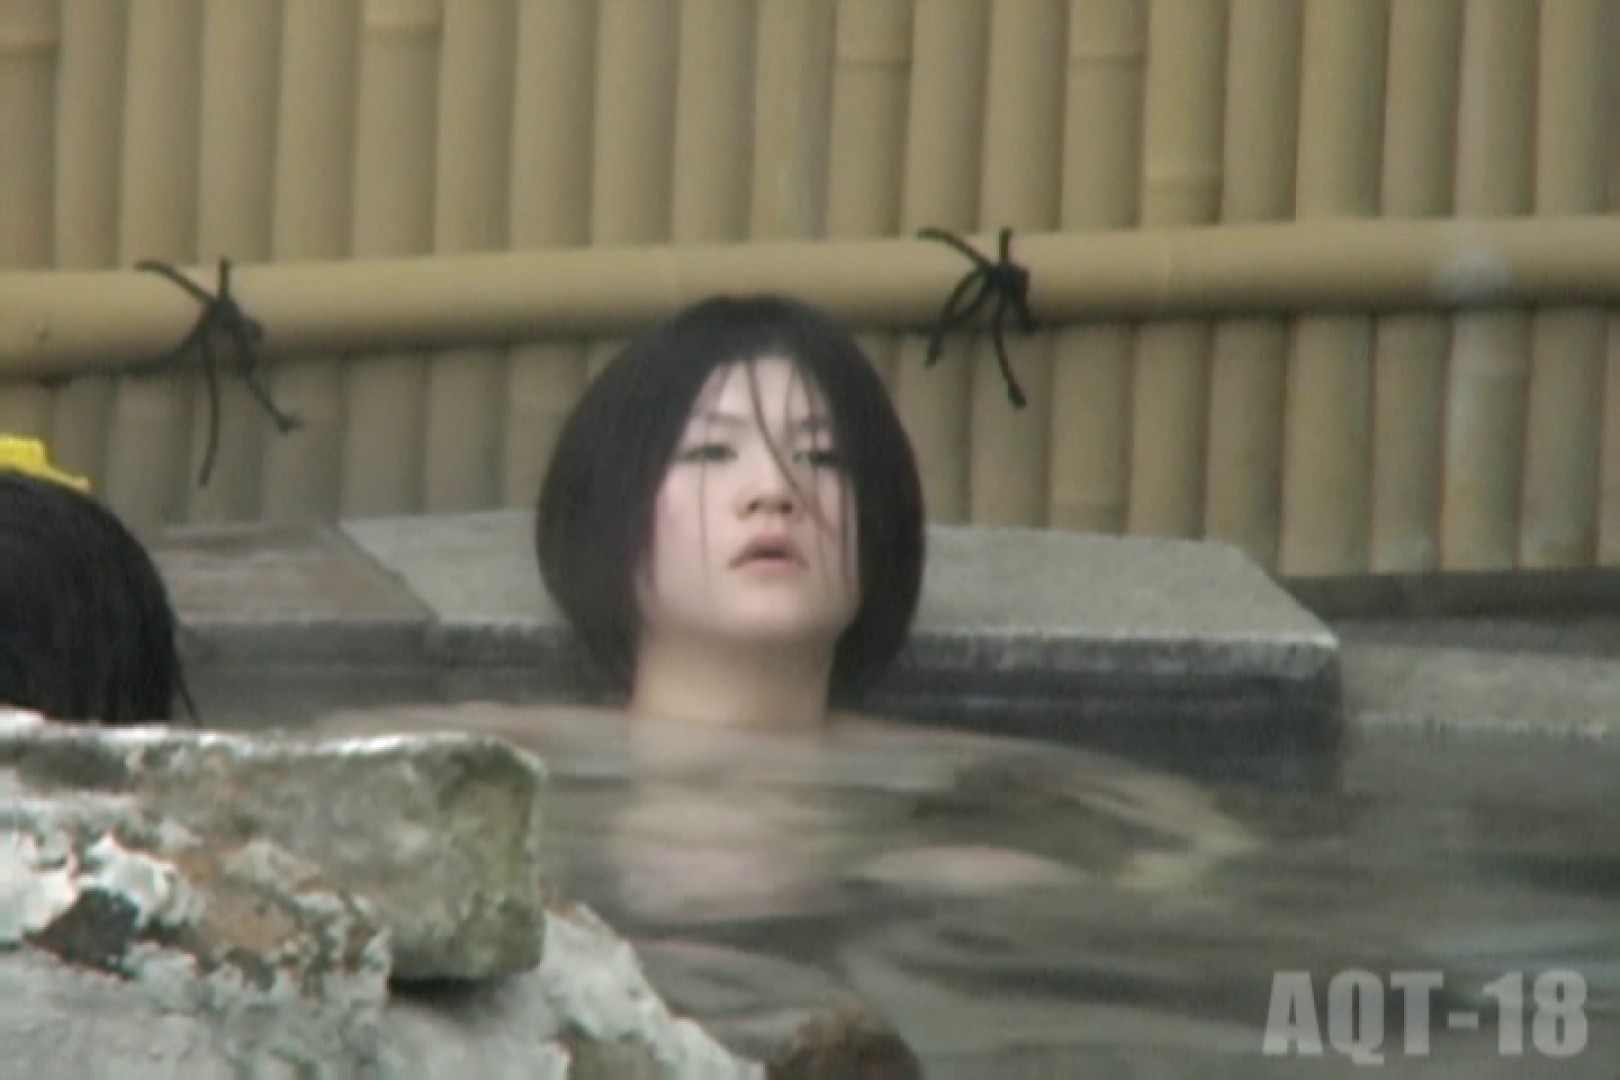 Aquaな露天風呂Vol.859 露天風呂編  76PIX 10